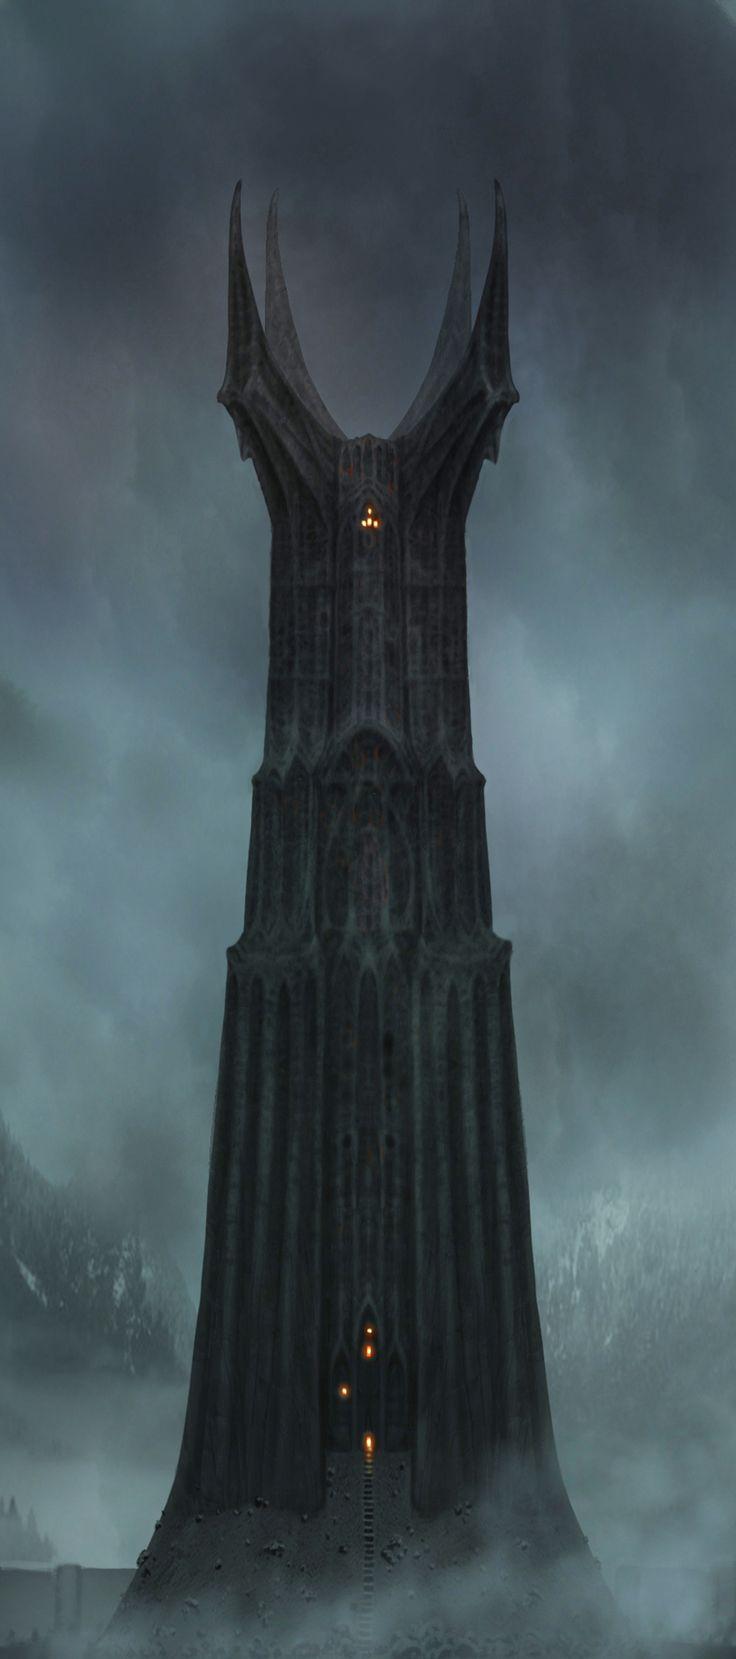 wizard's tower minecraft - Google Search